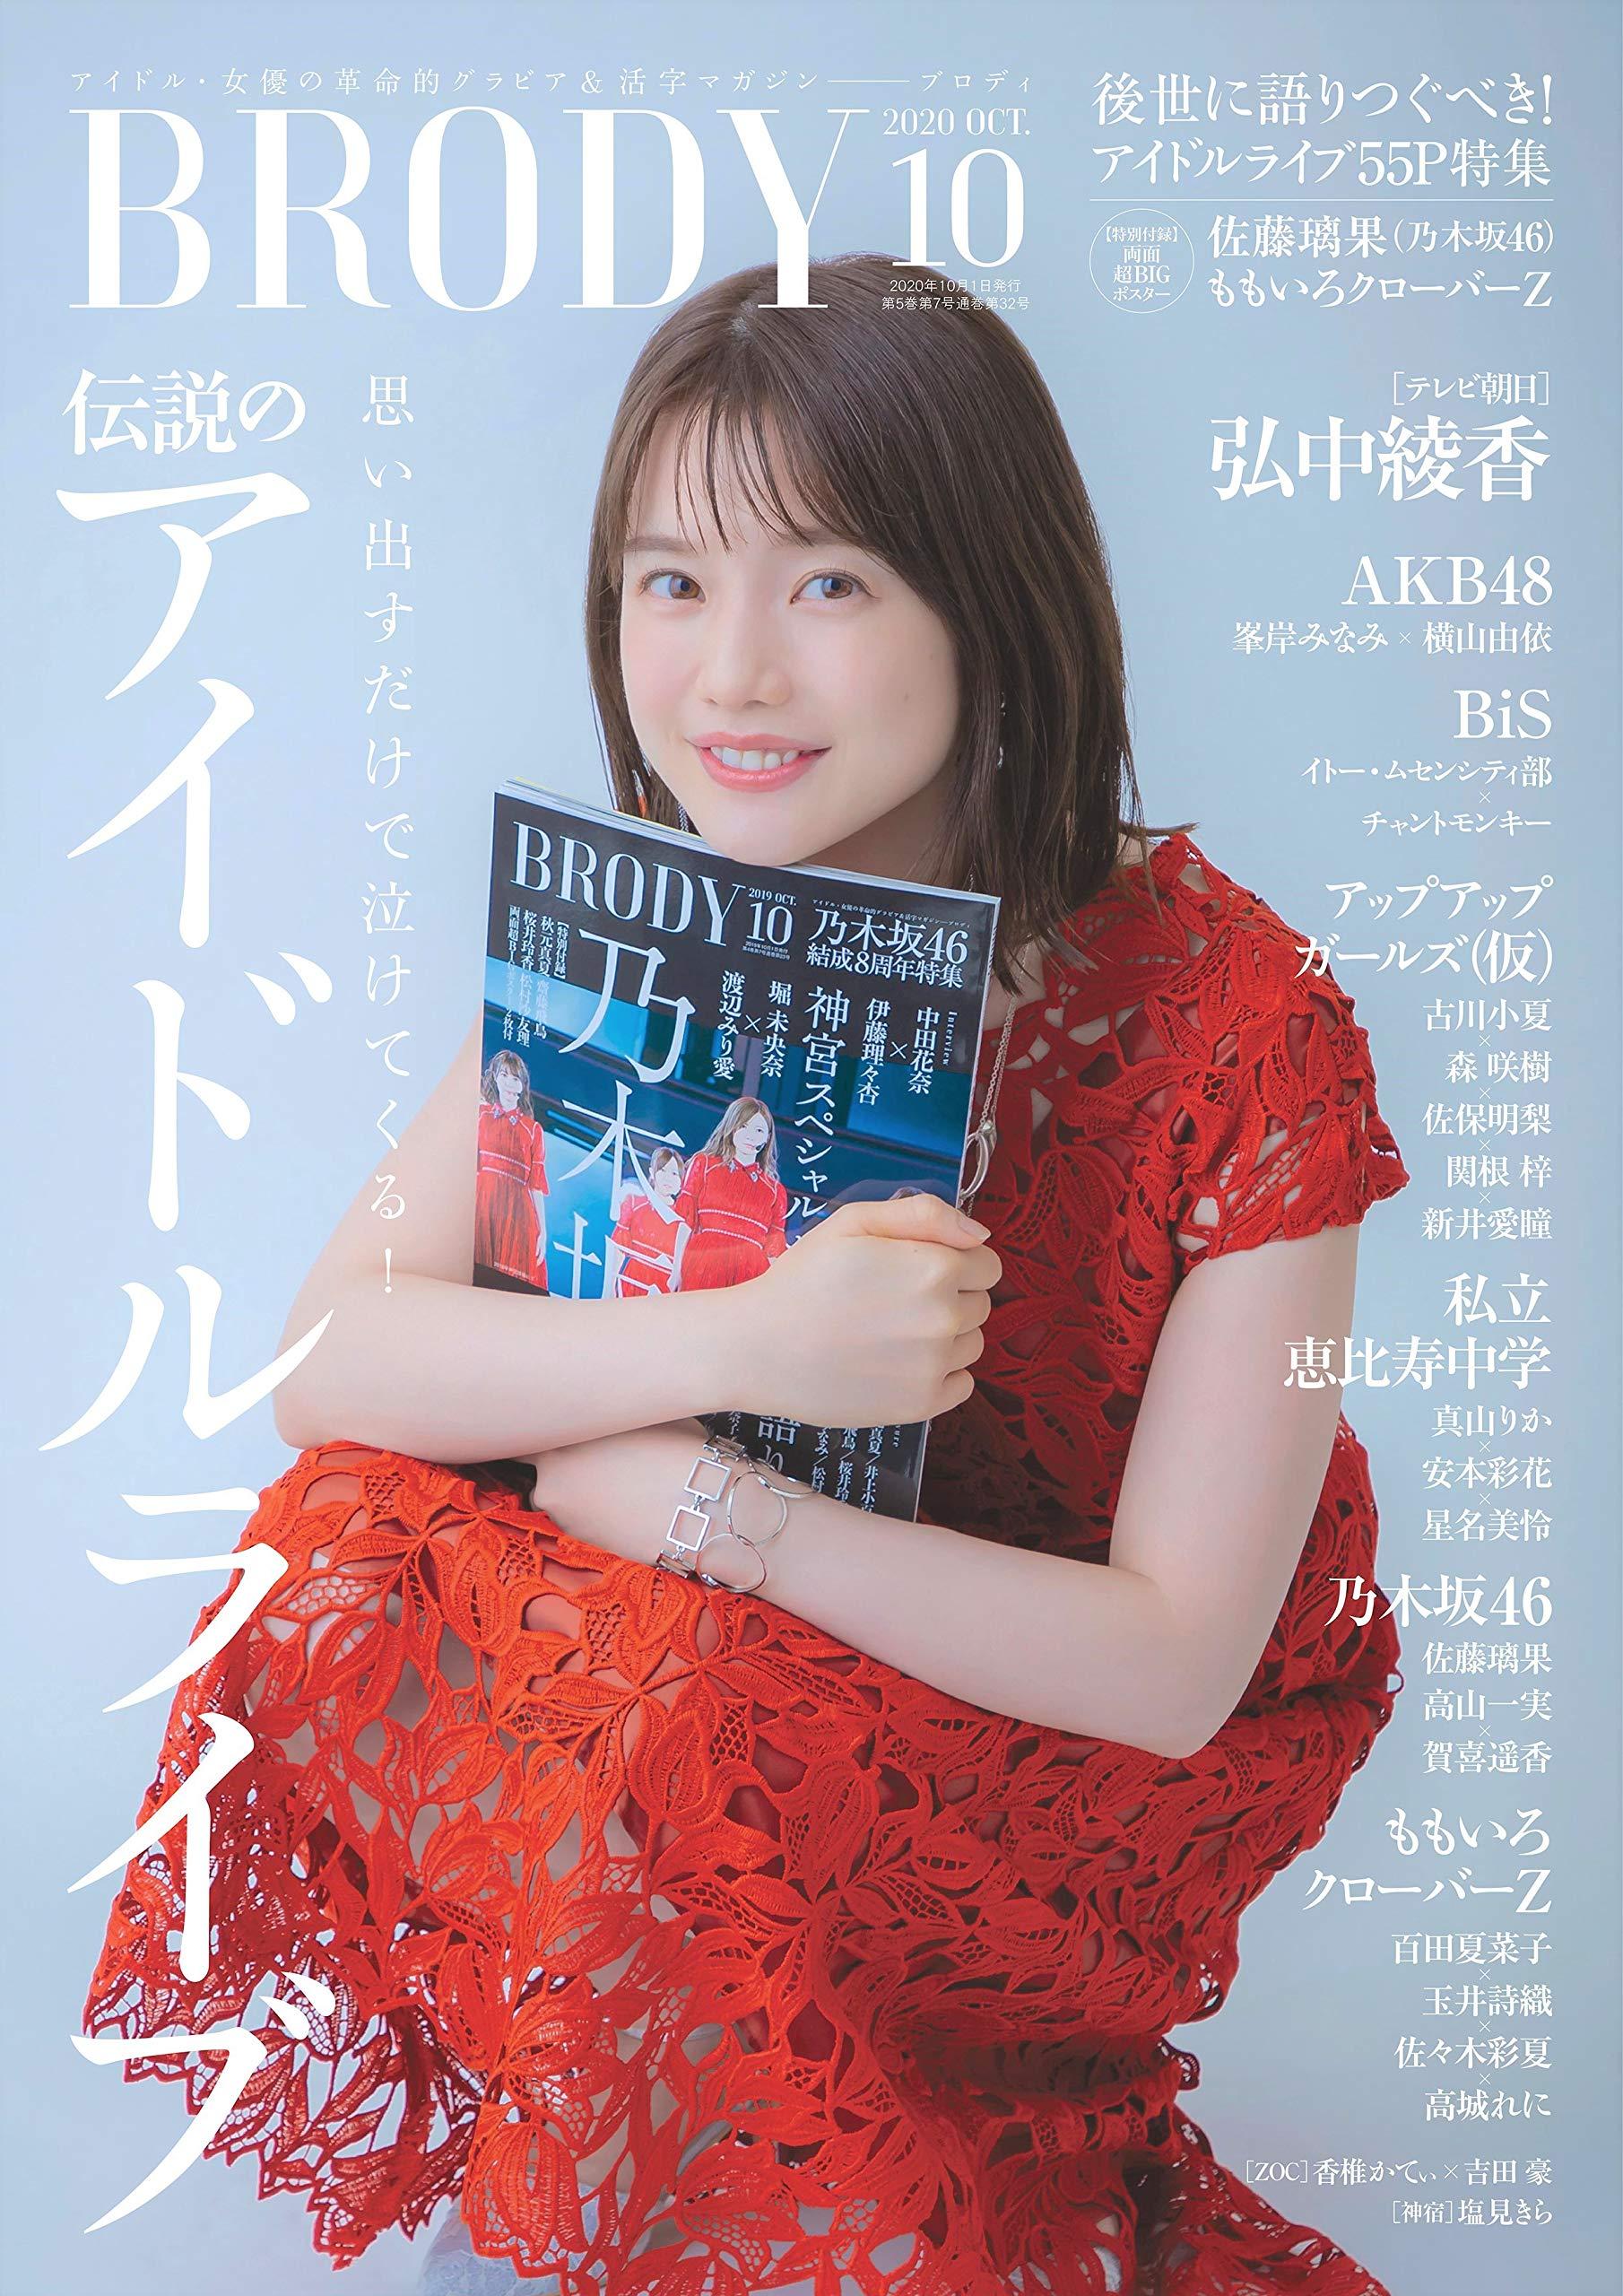 BRODY 2020年10月号 乃木坂46 弘中綾香